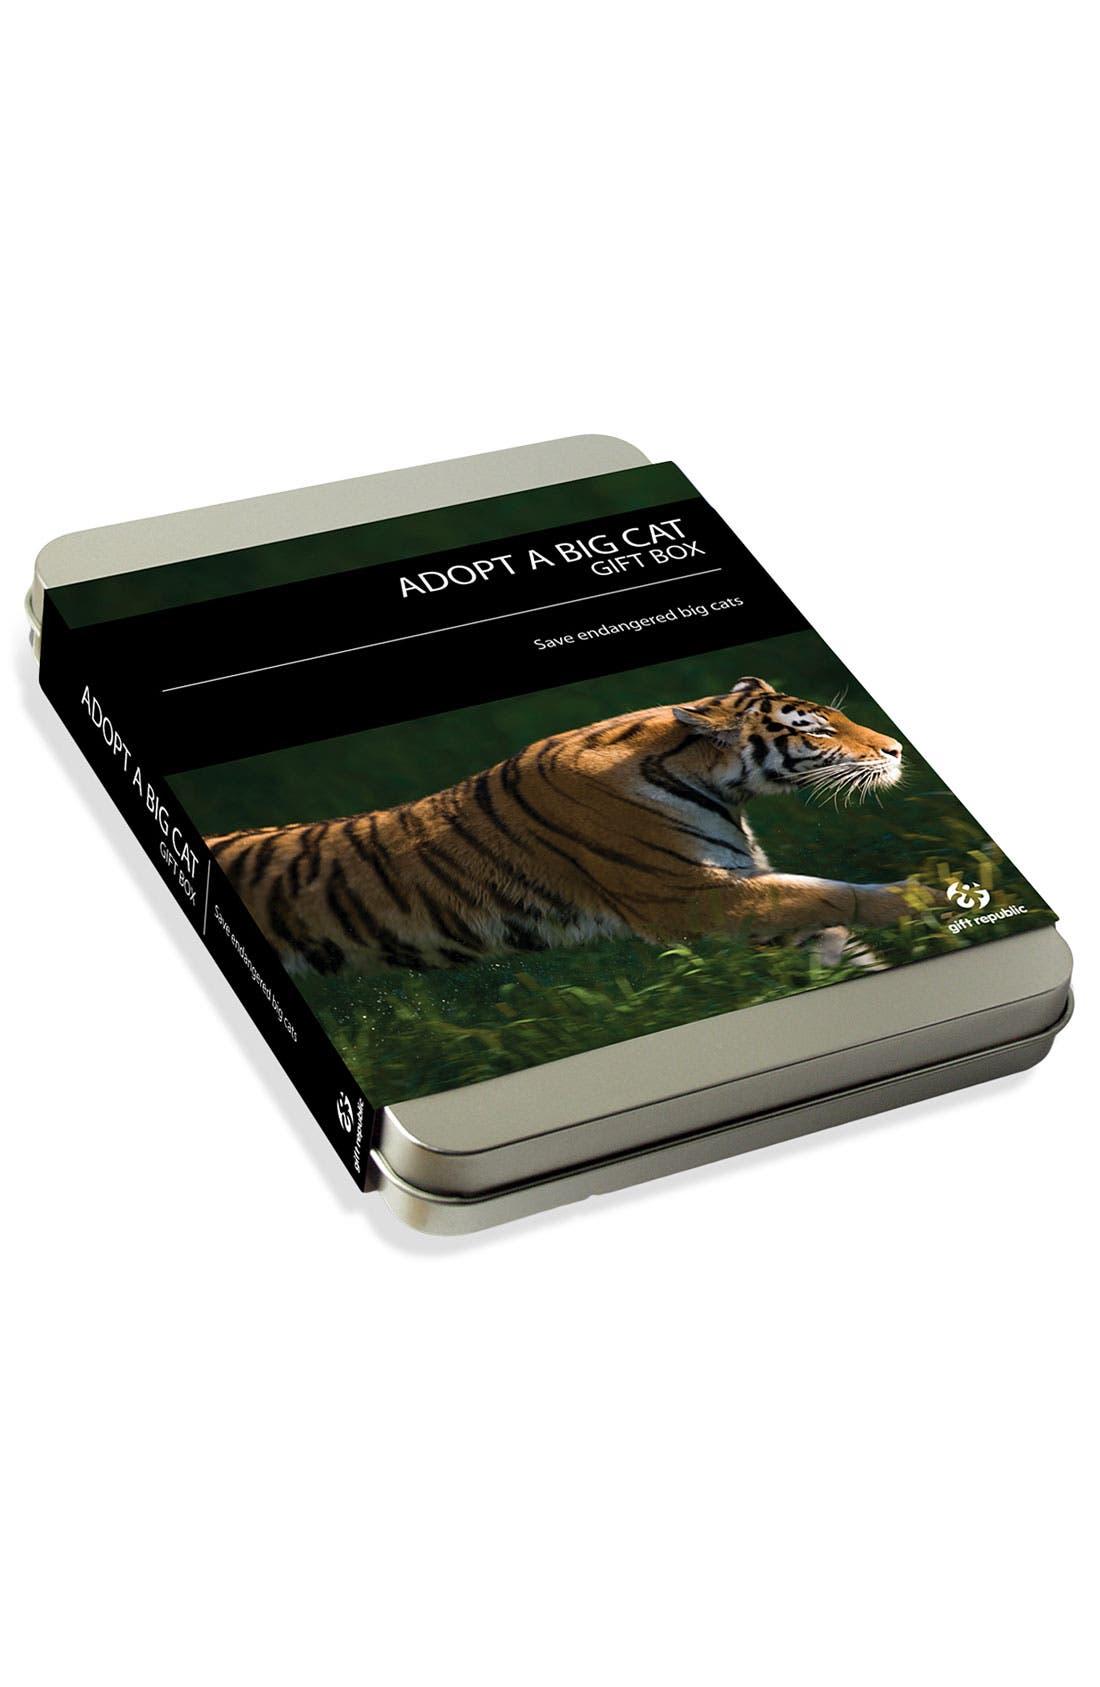 'Adopt a Big Cat' Gift Box,                         Main,                         color, 000